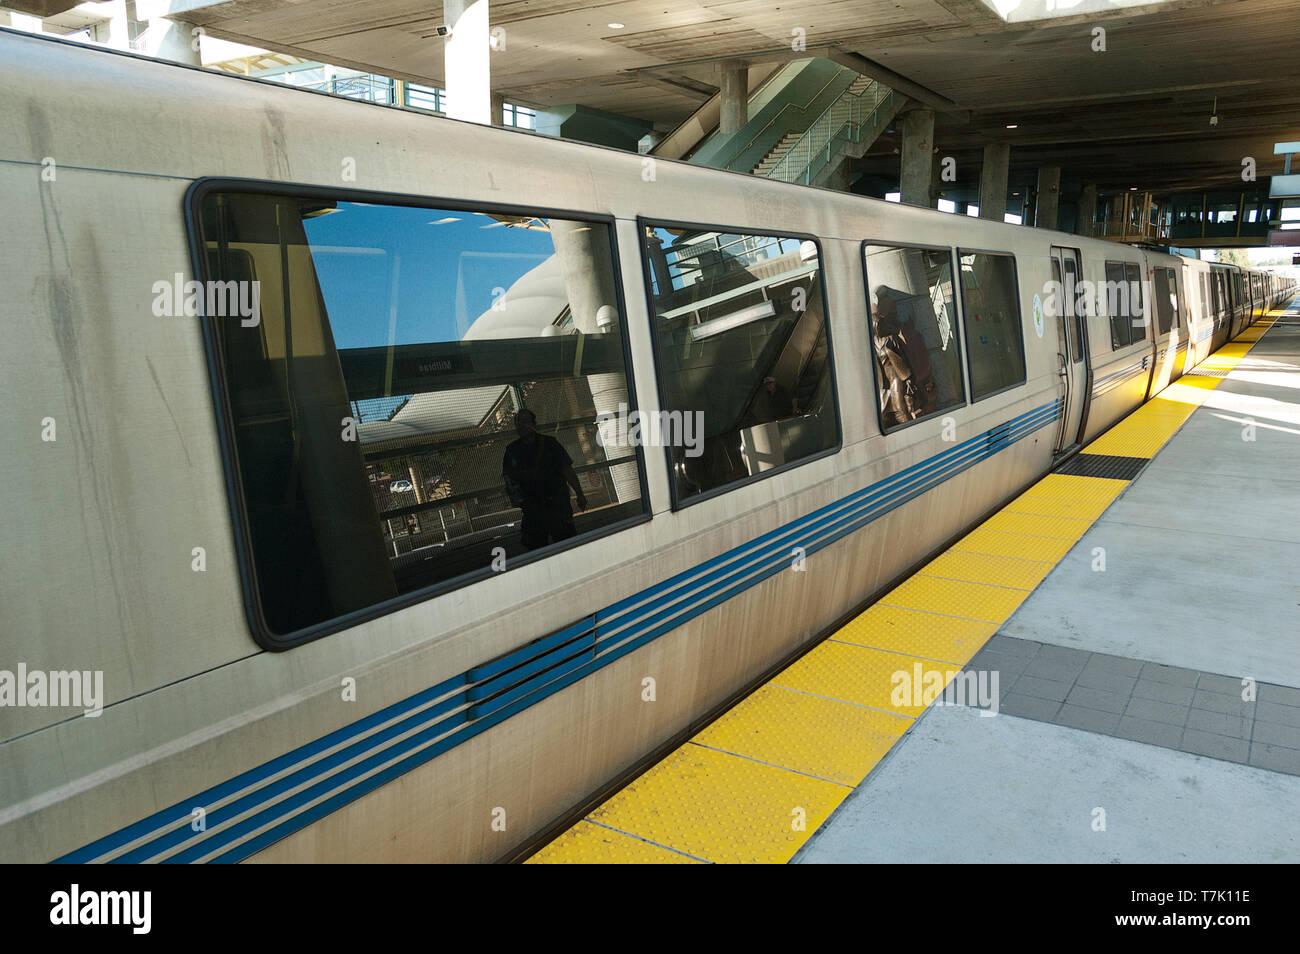 BART train at Millbrae train station California USA - Stock Image